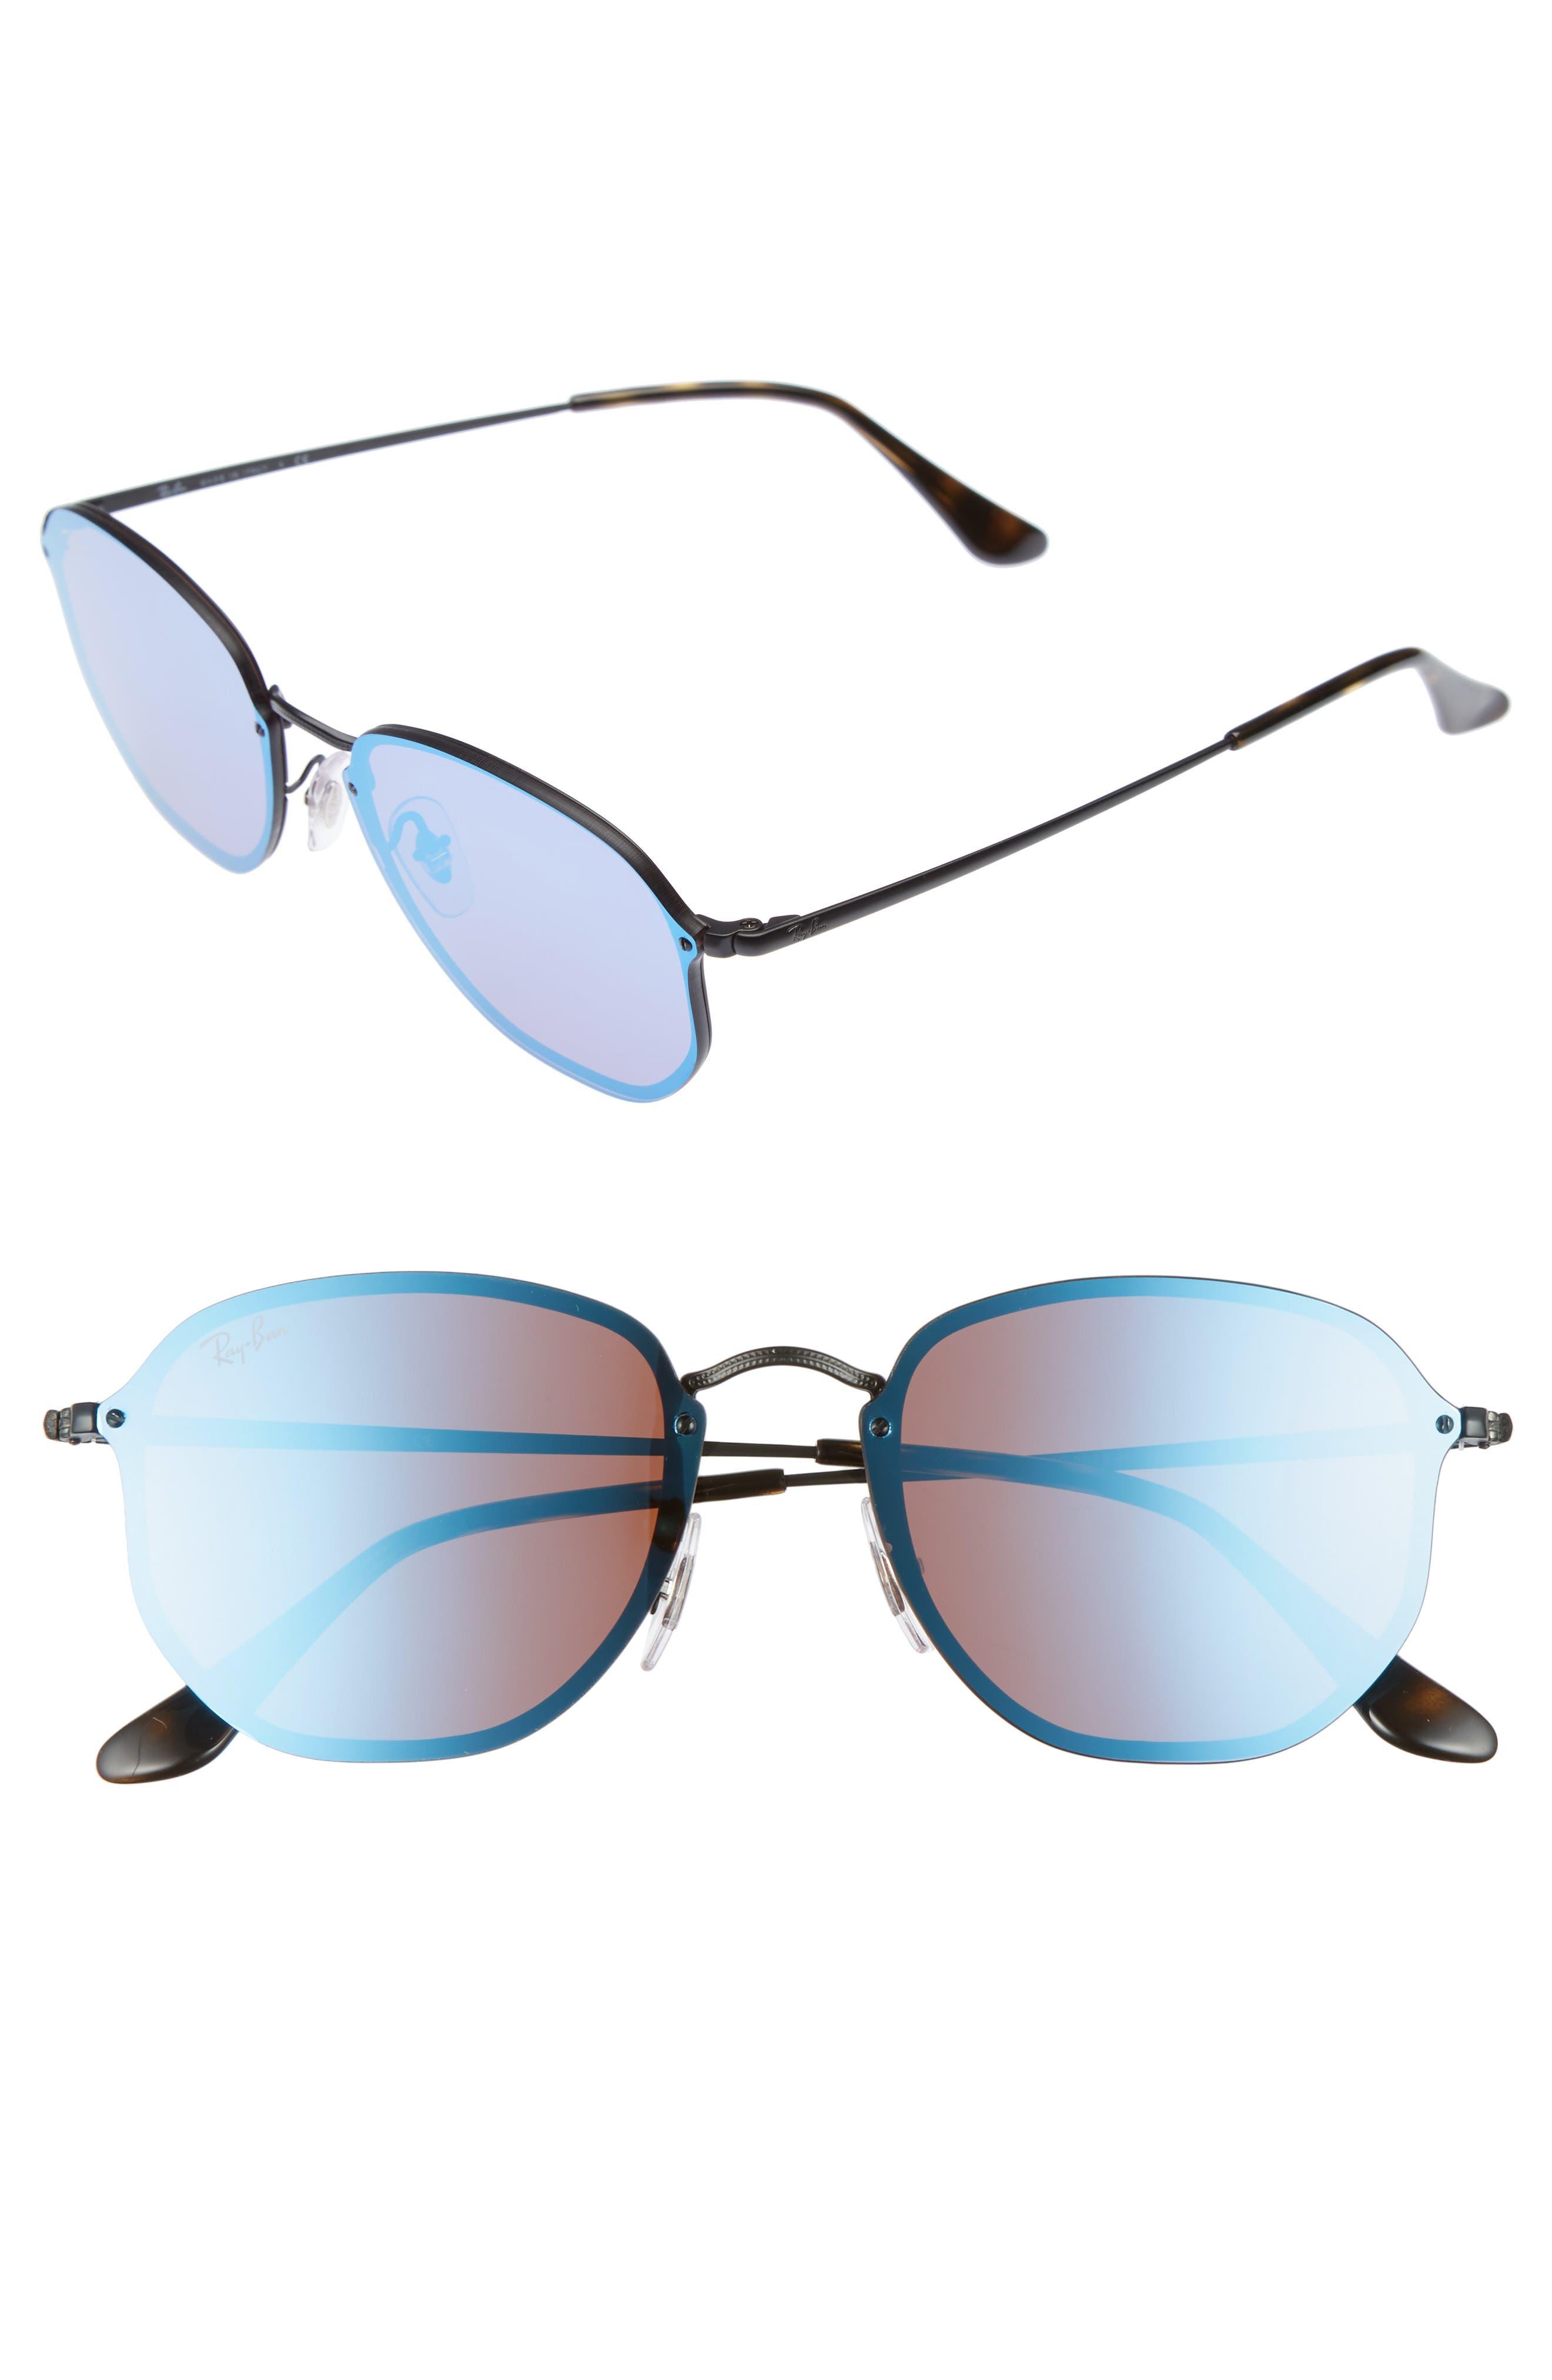 58mm Round Sunglasses,                         Main,                         color, Shiny Black